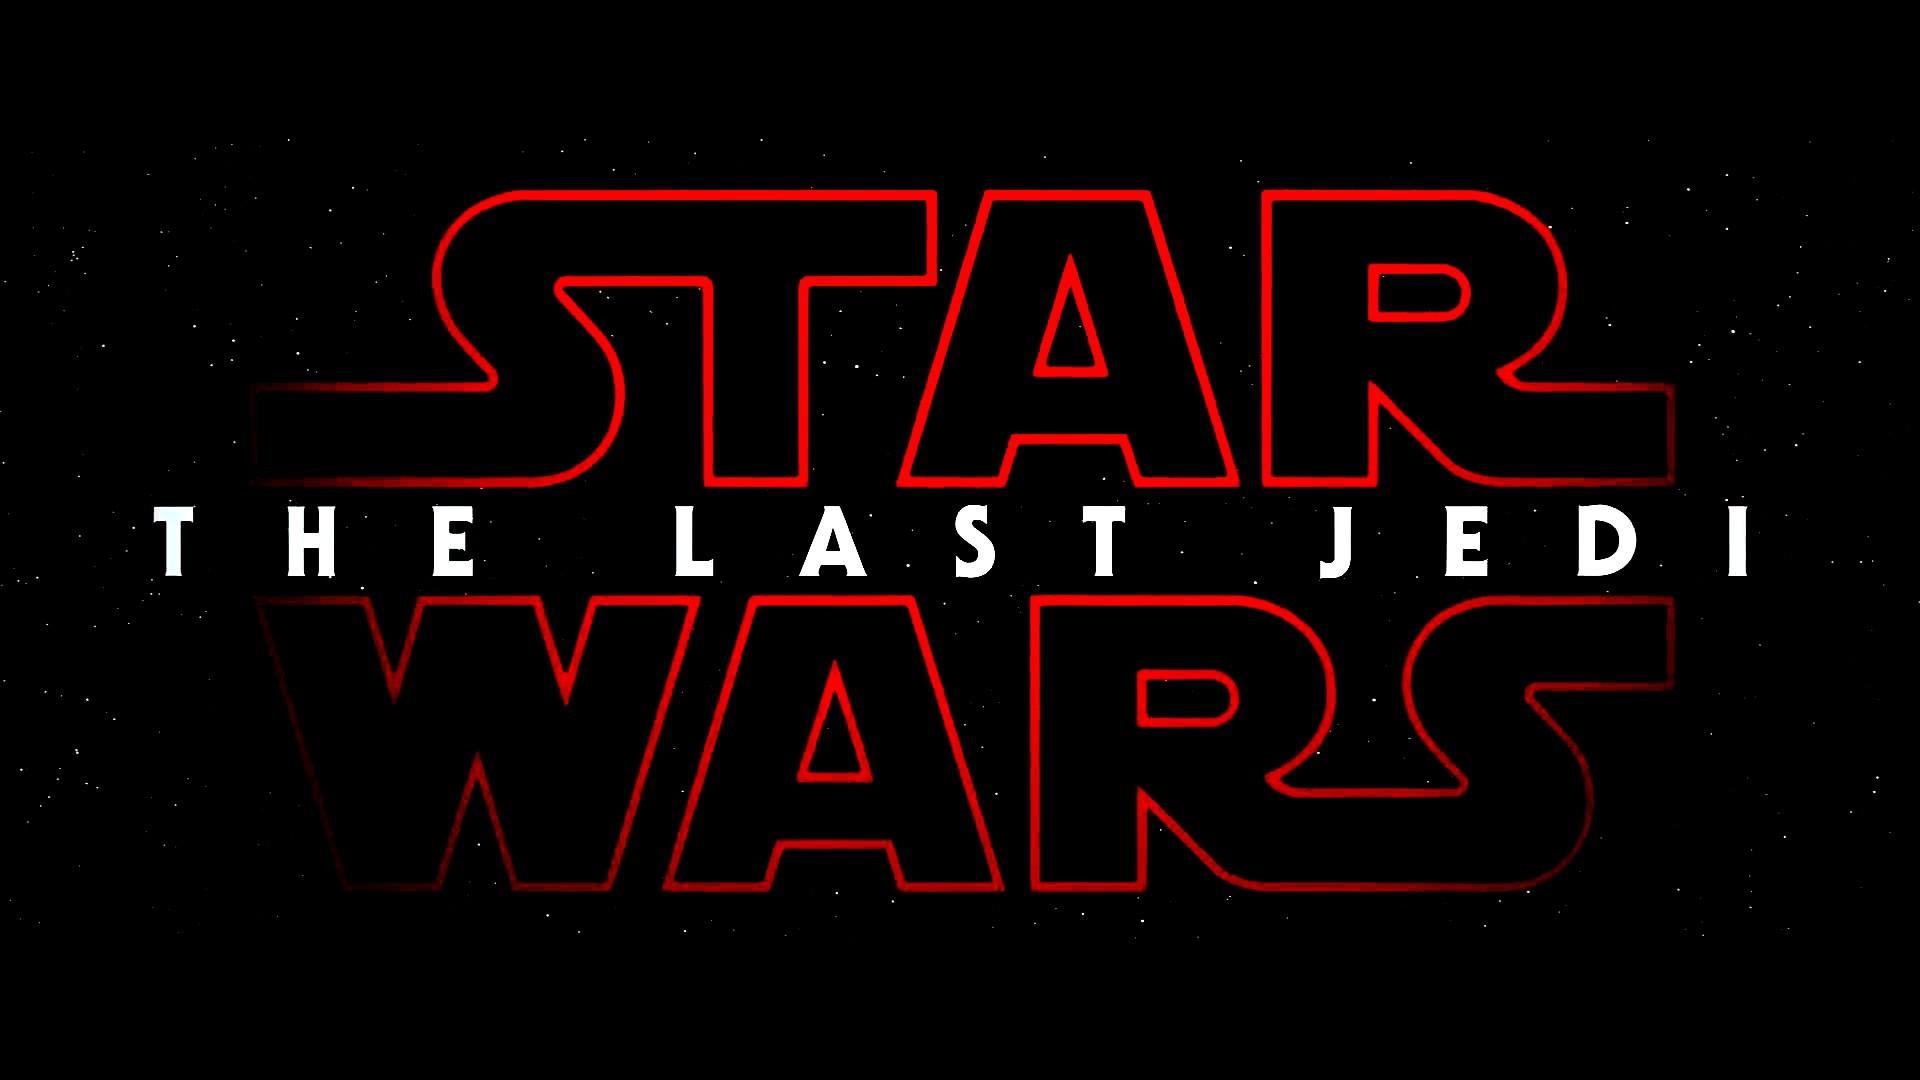 … star wars the last jedi logo wallpaper 17150 baltana …